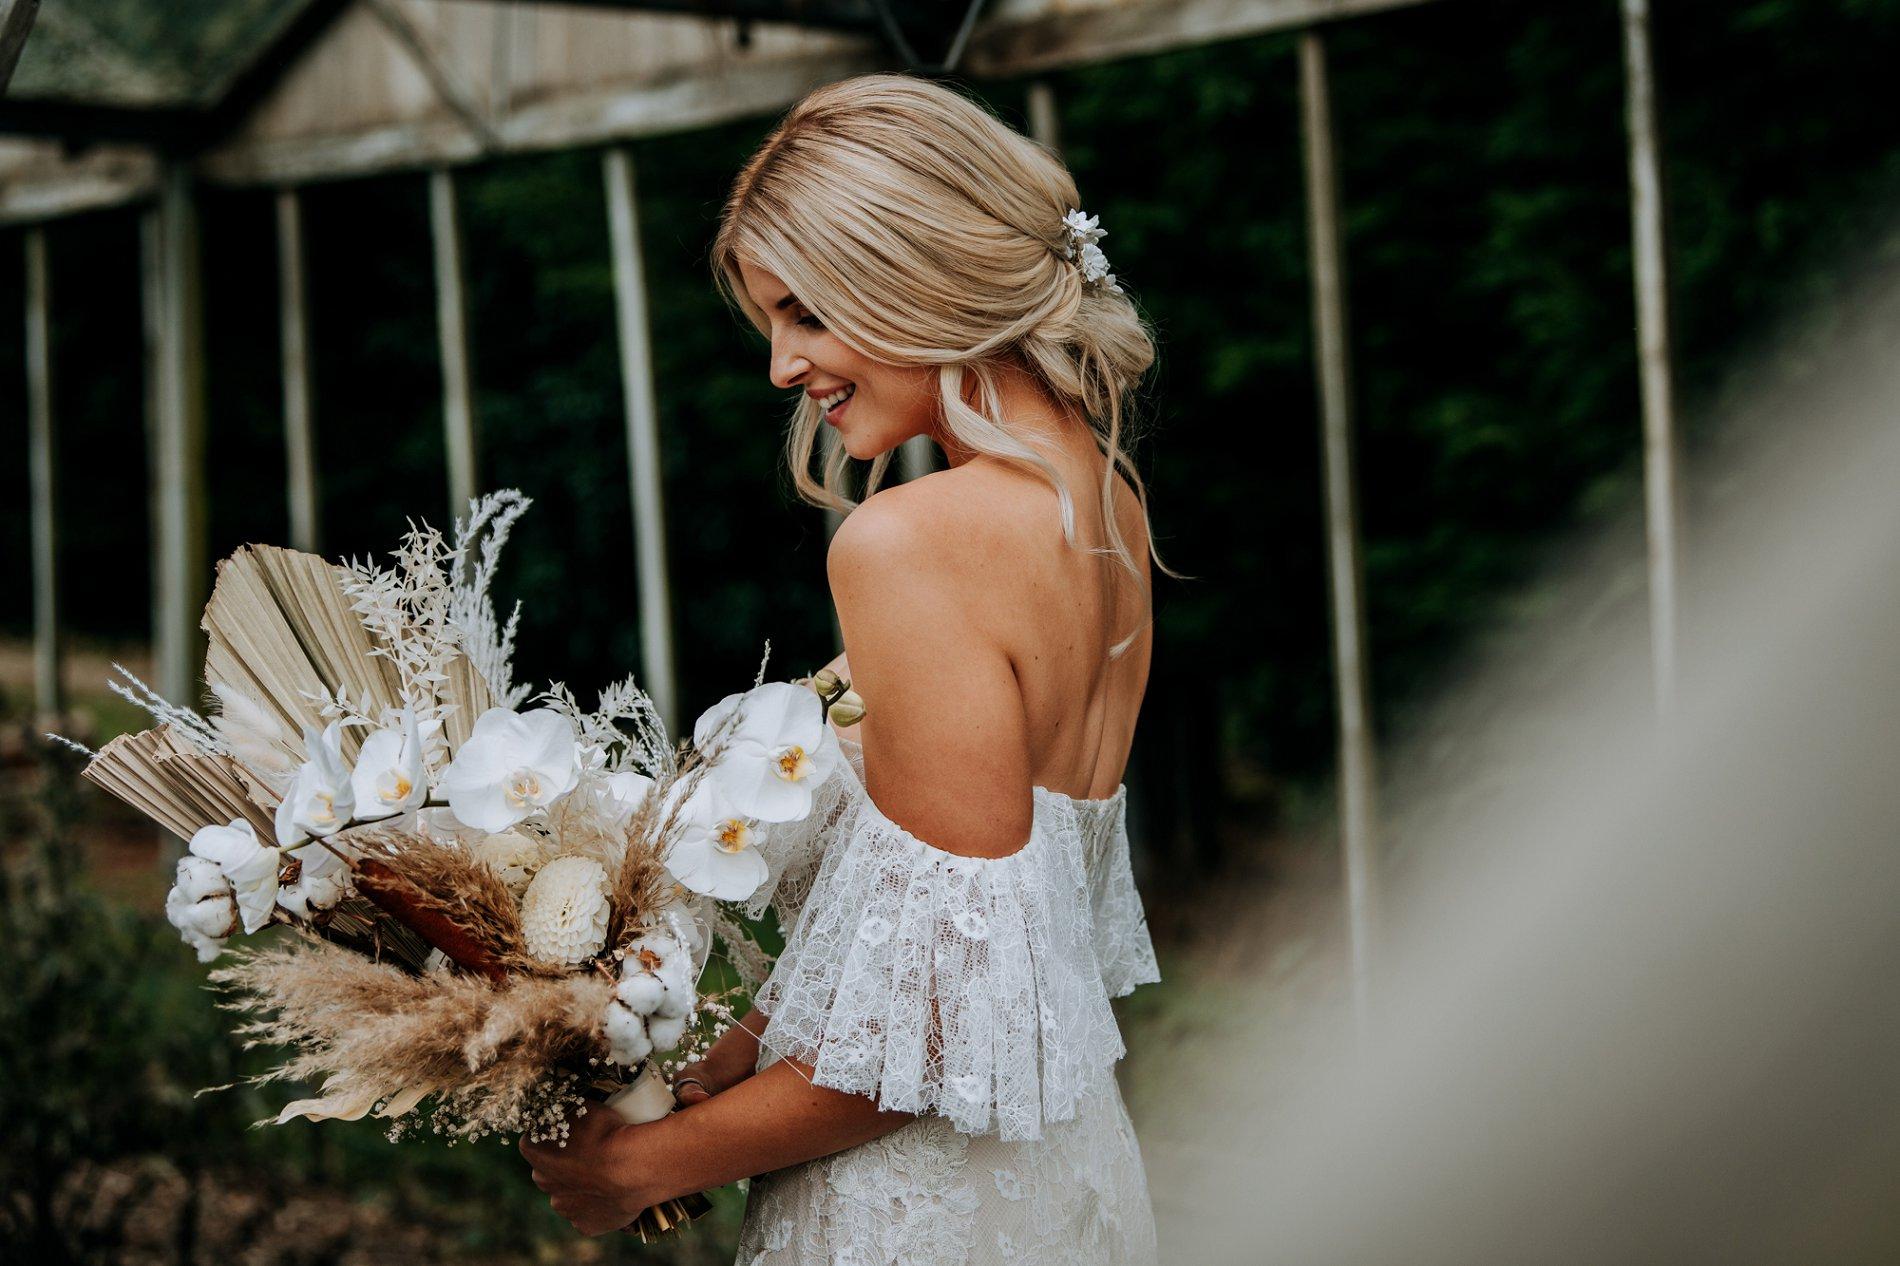 A Creative Elizabeth Lucas Bridal Fashion Editorial in Yorkshire (c) M and G Wedding Photography (5)